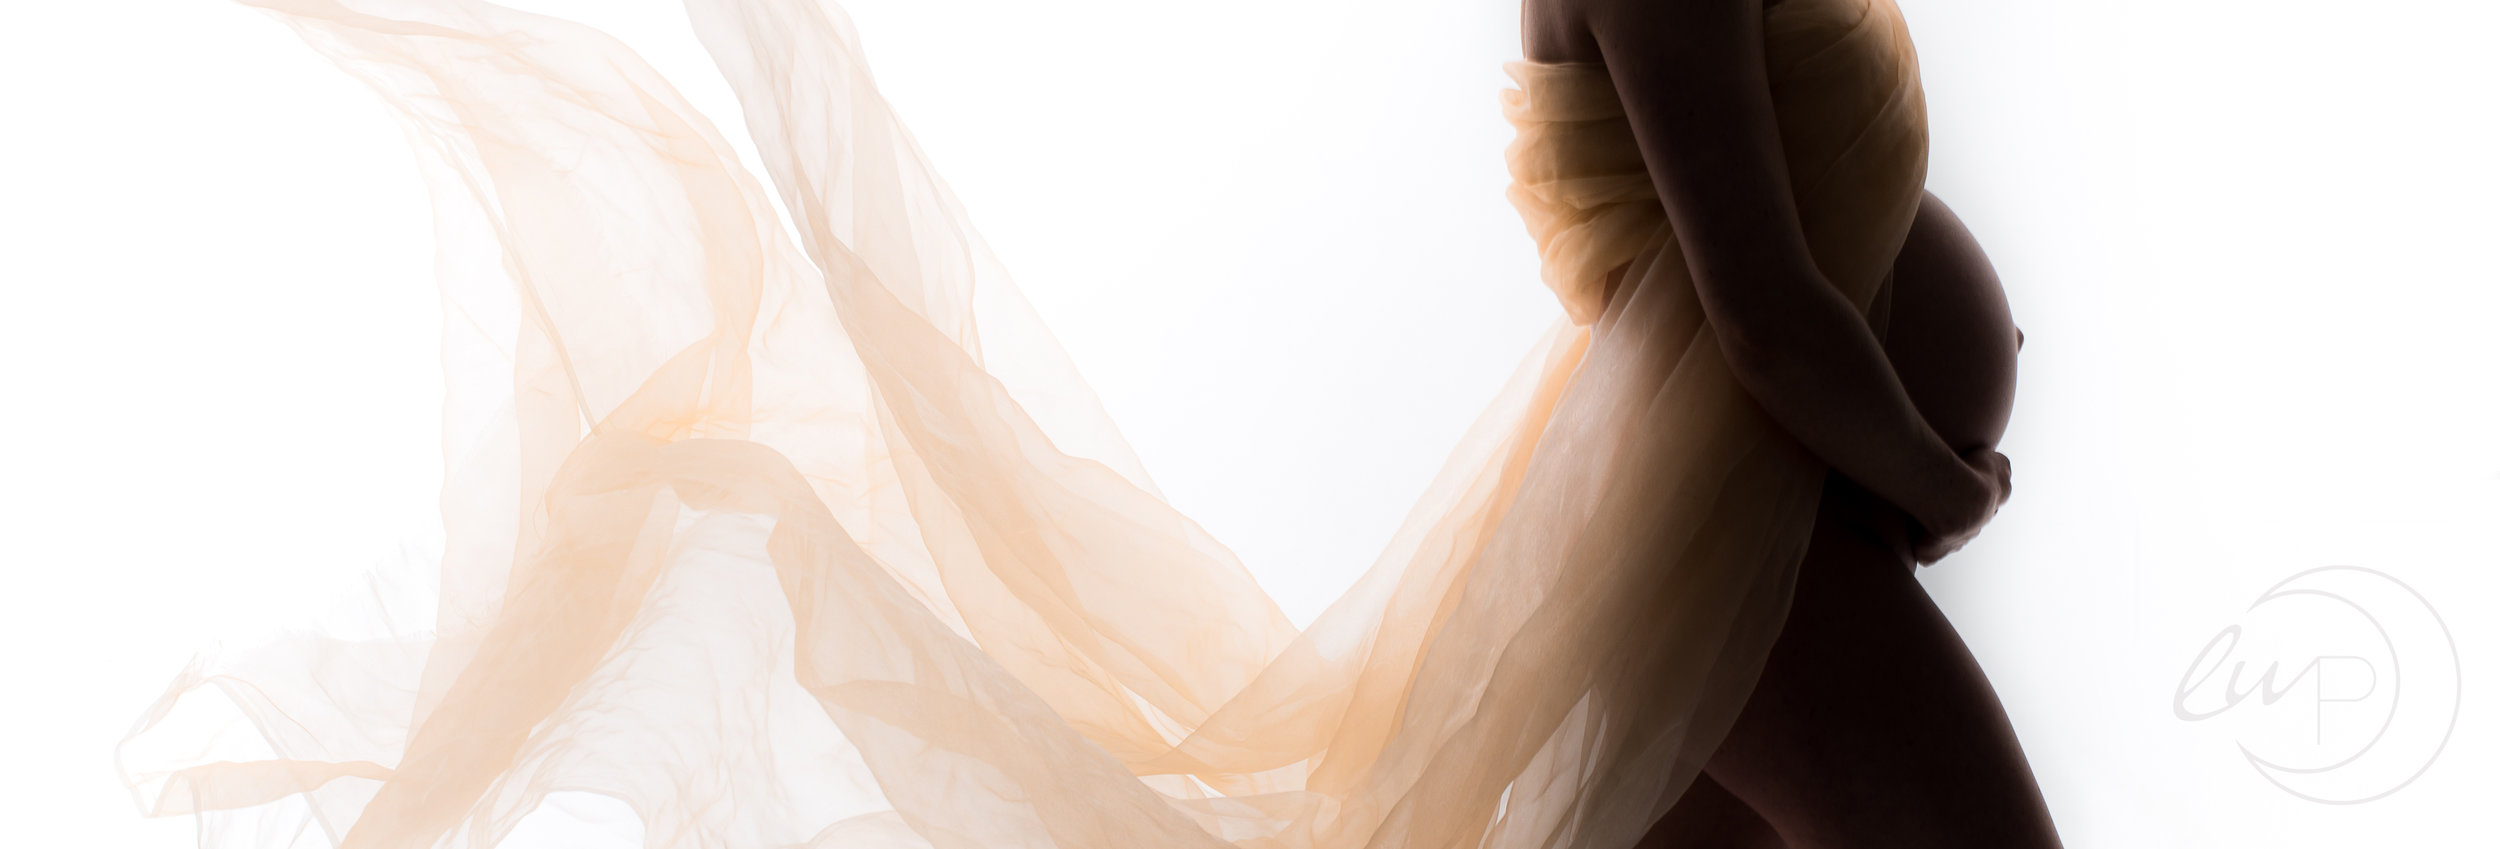 maternity photo shoots essex